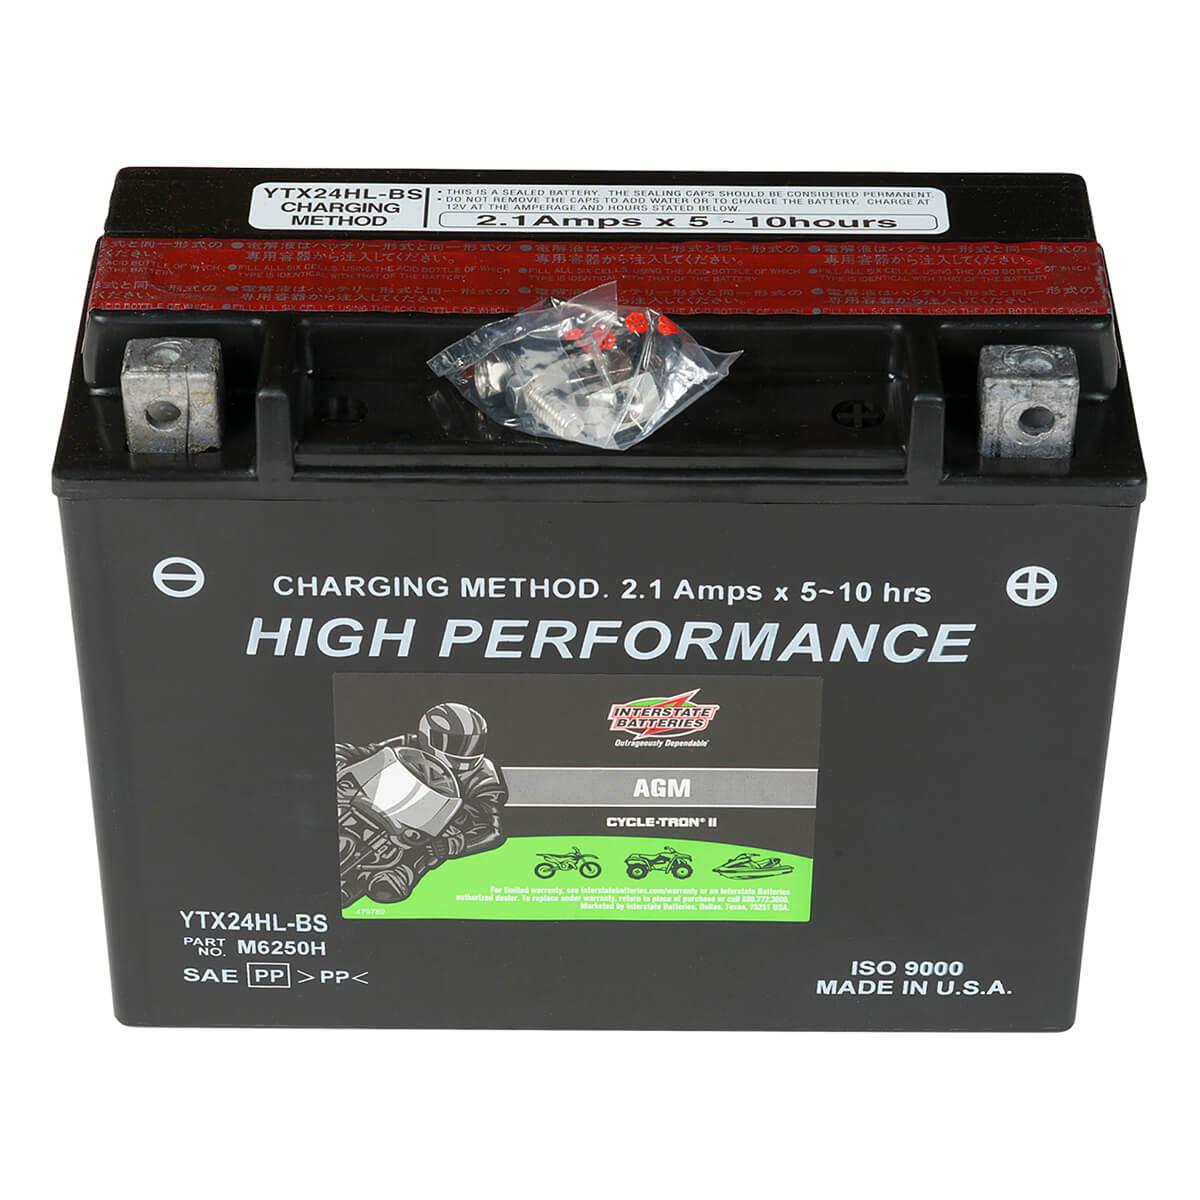 Cycletron AGM 12 Volt Battery, Non Spillable - CYTX24HL-BS